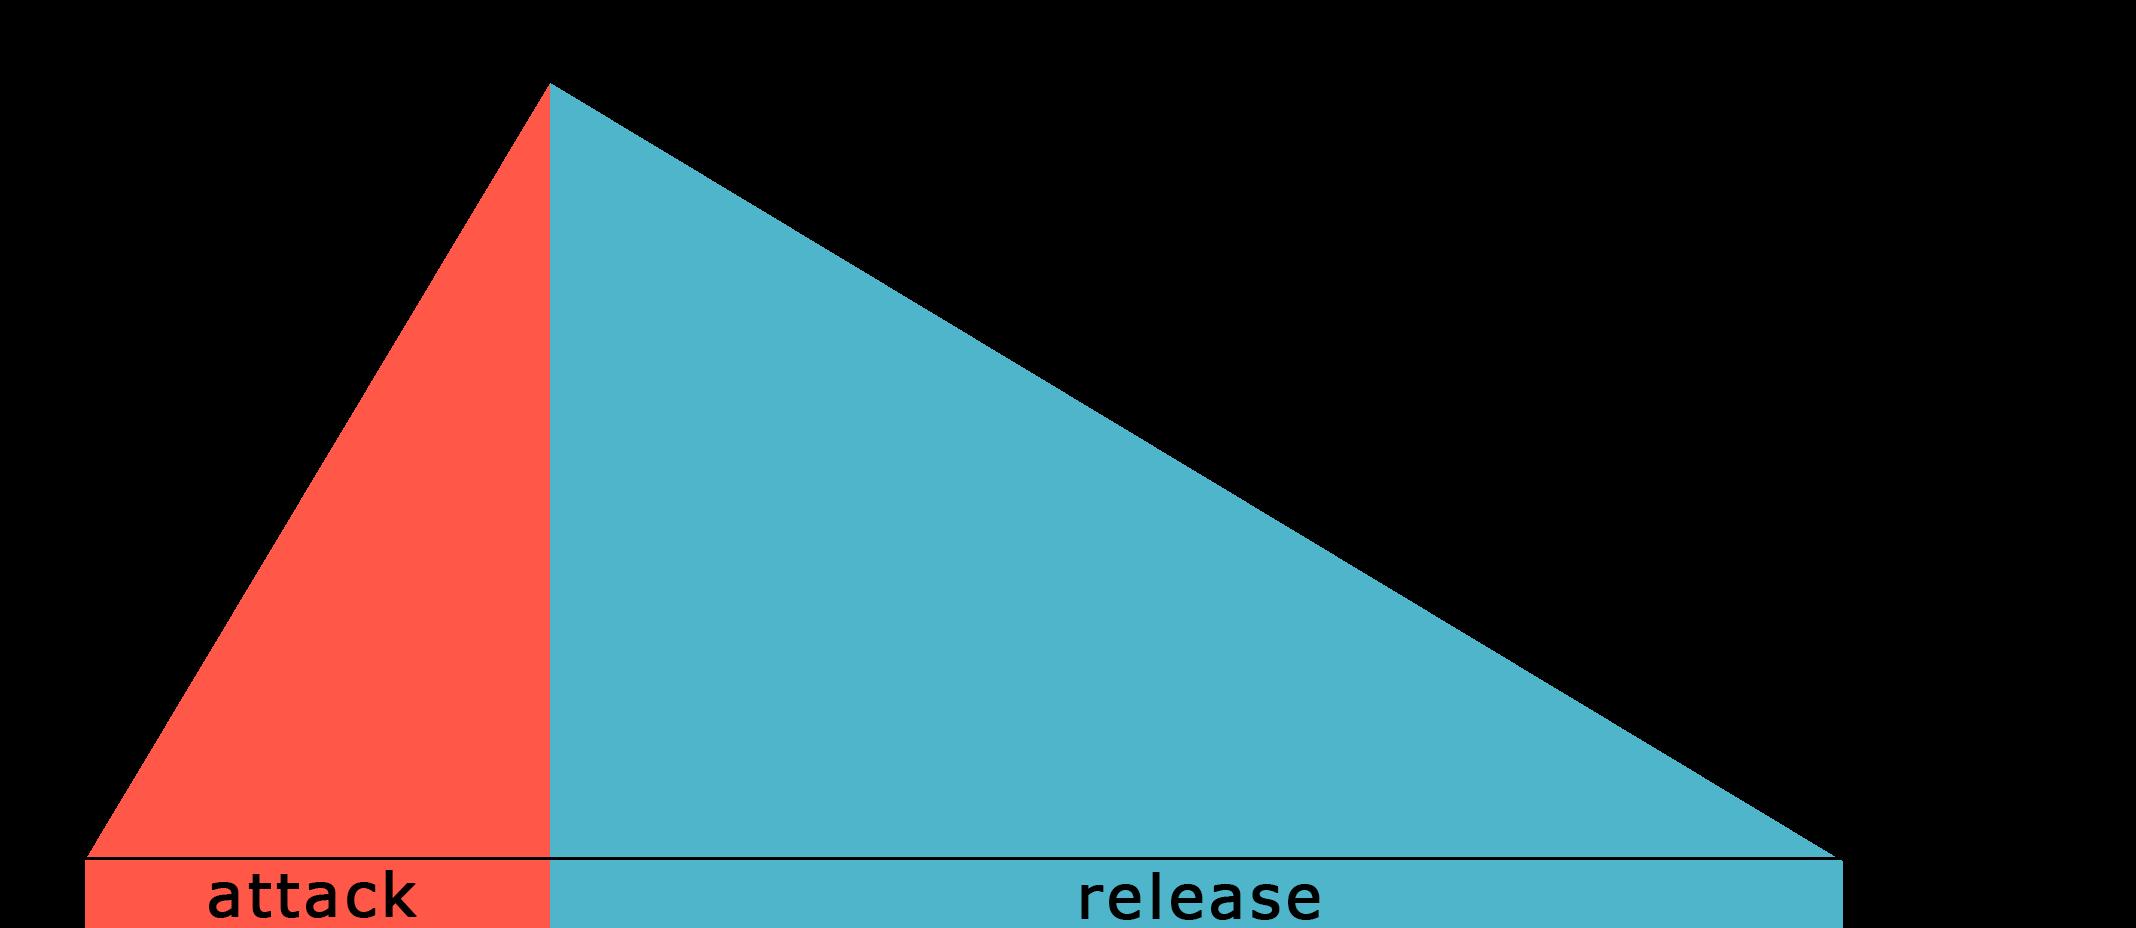 attack ja release